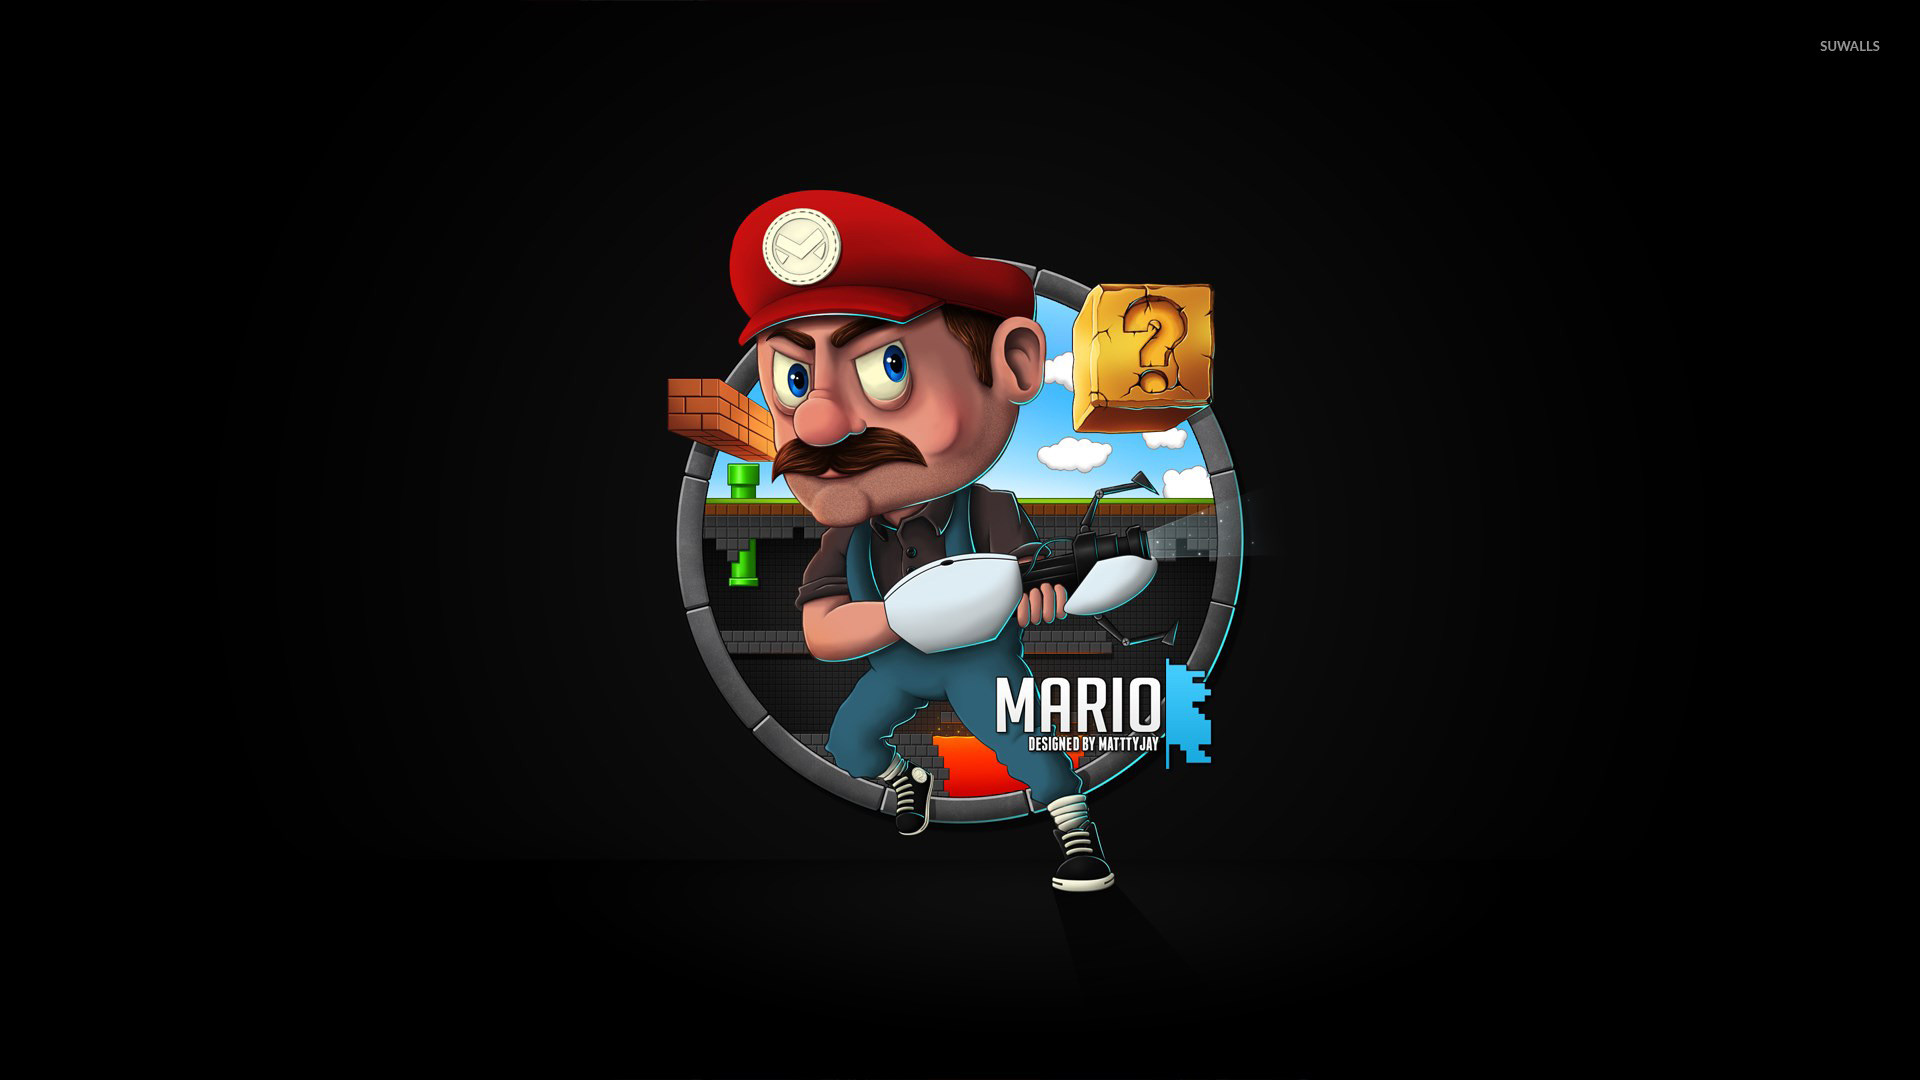 Mario [7] wallpaper